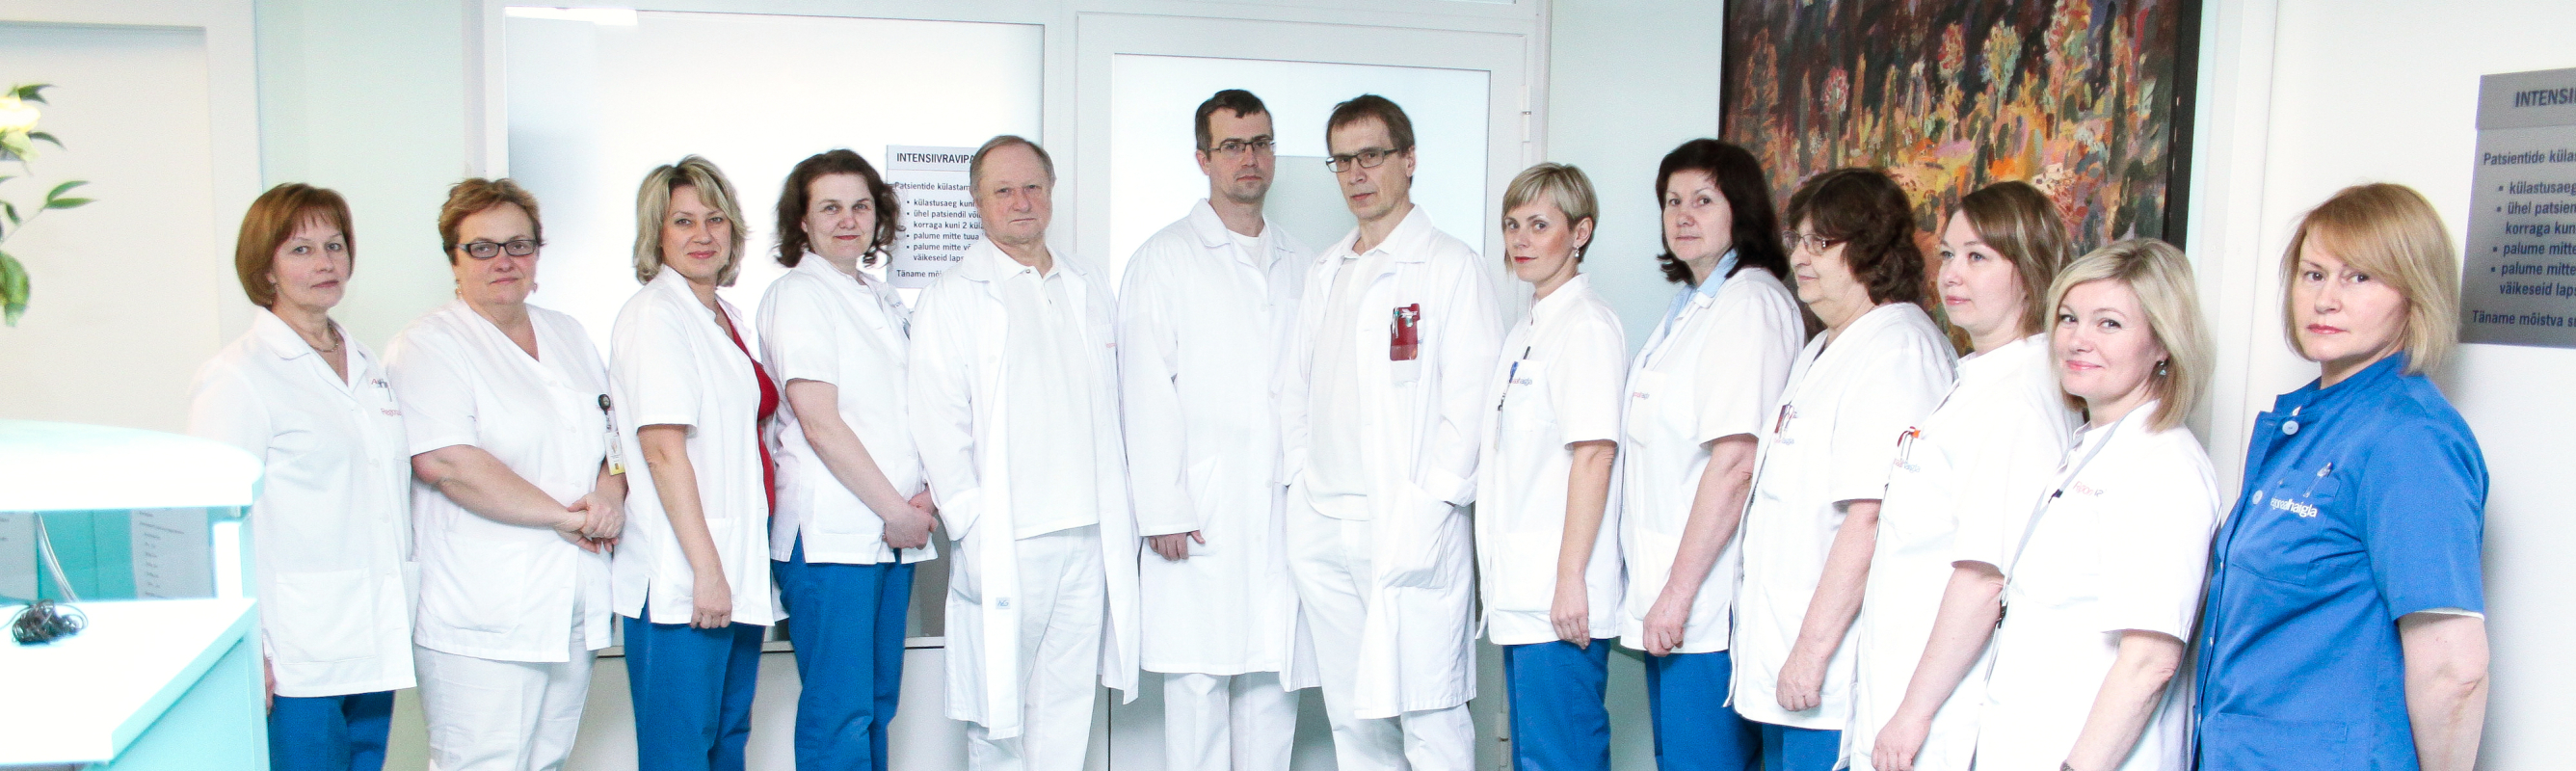 Kardiokirurgia osakond